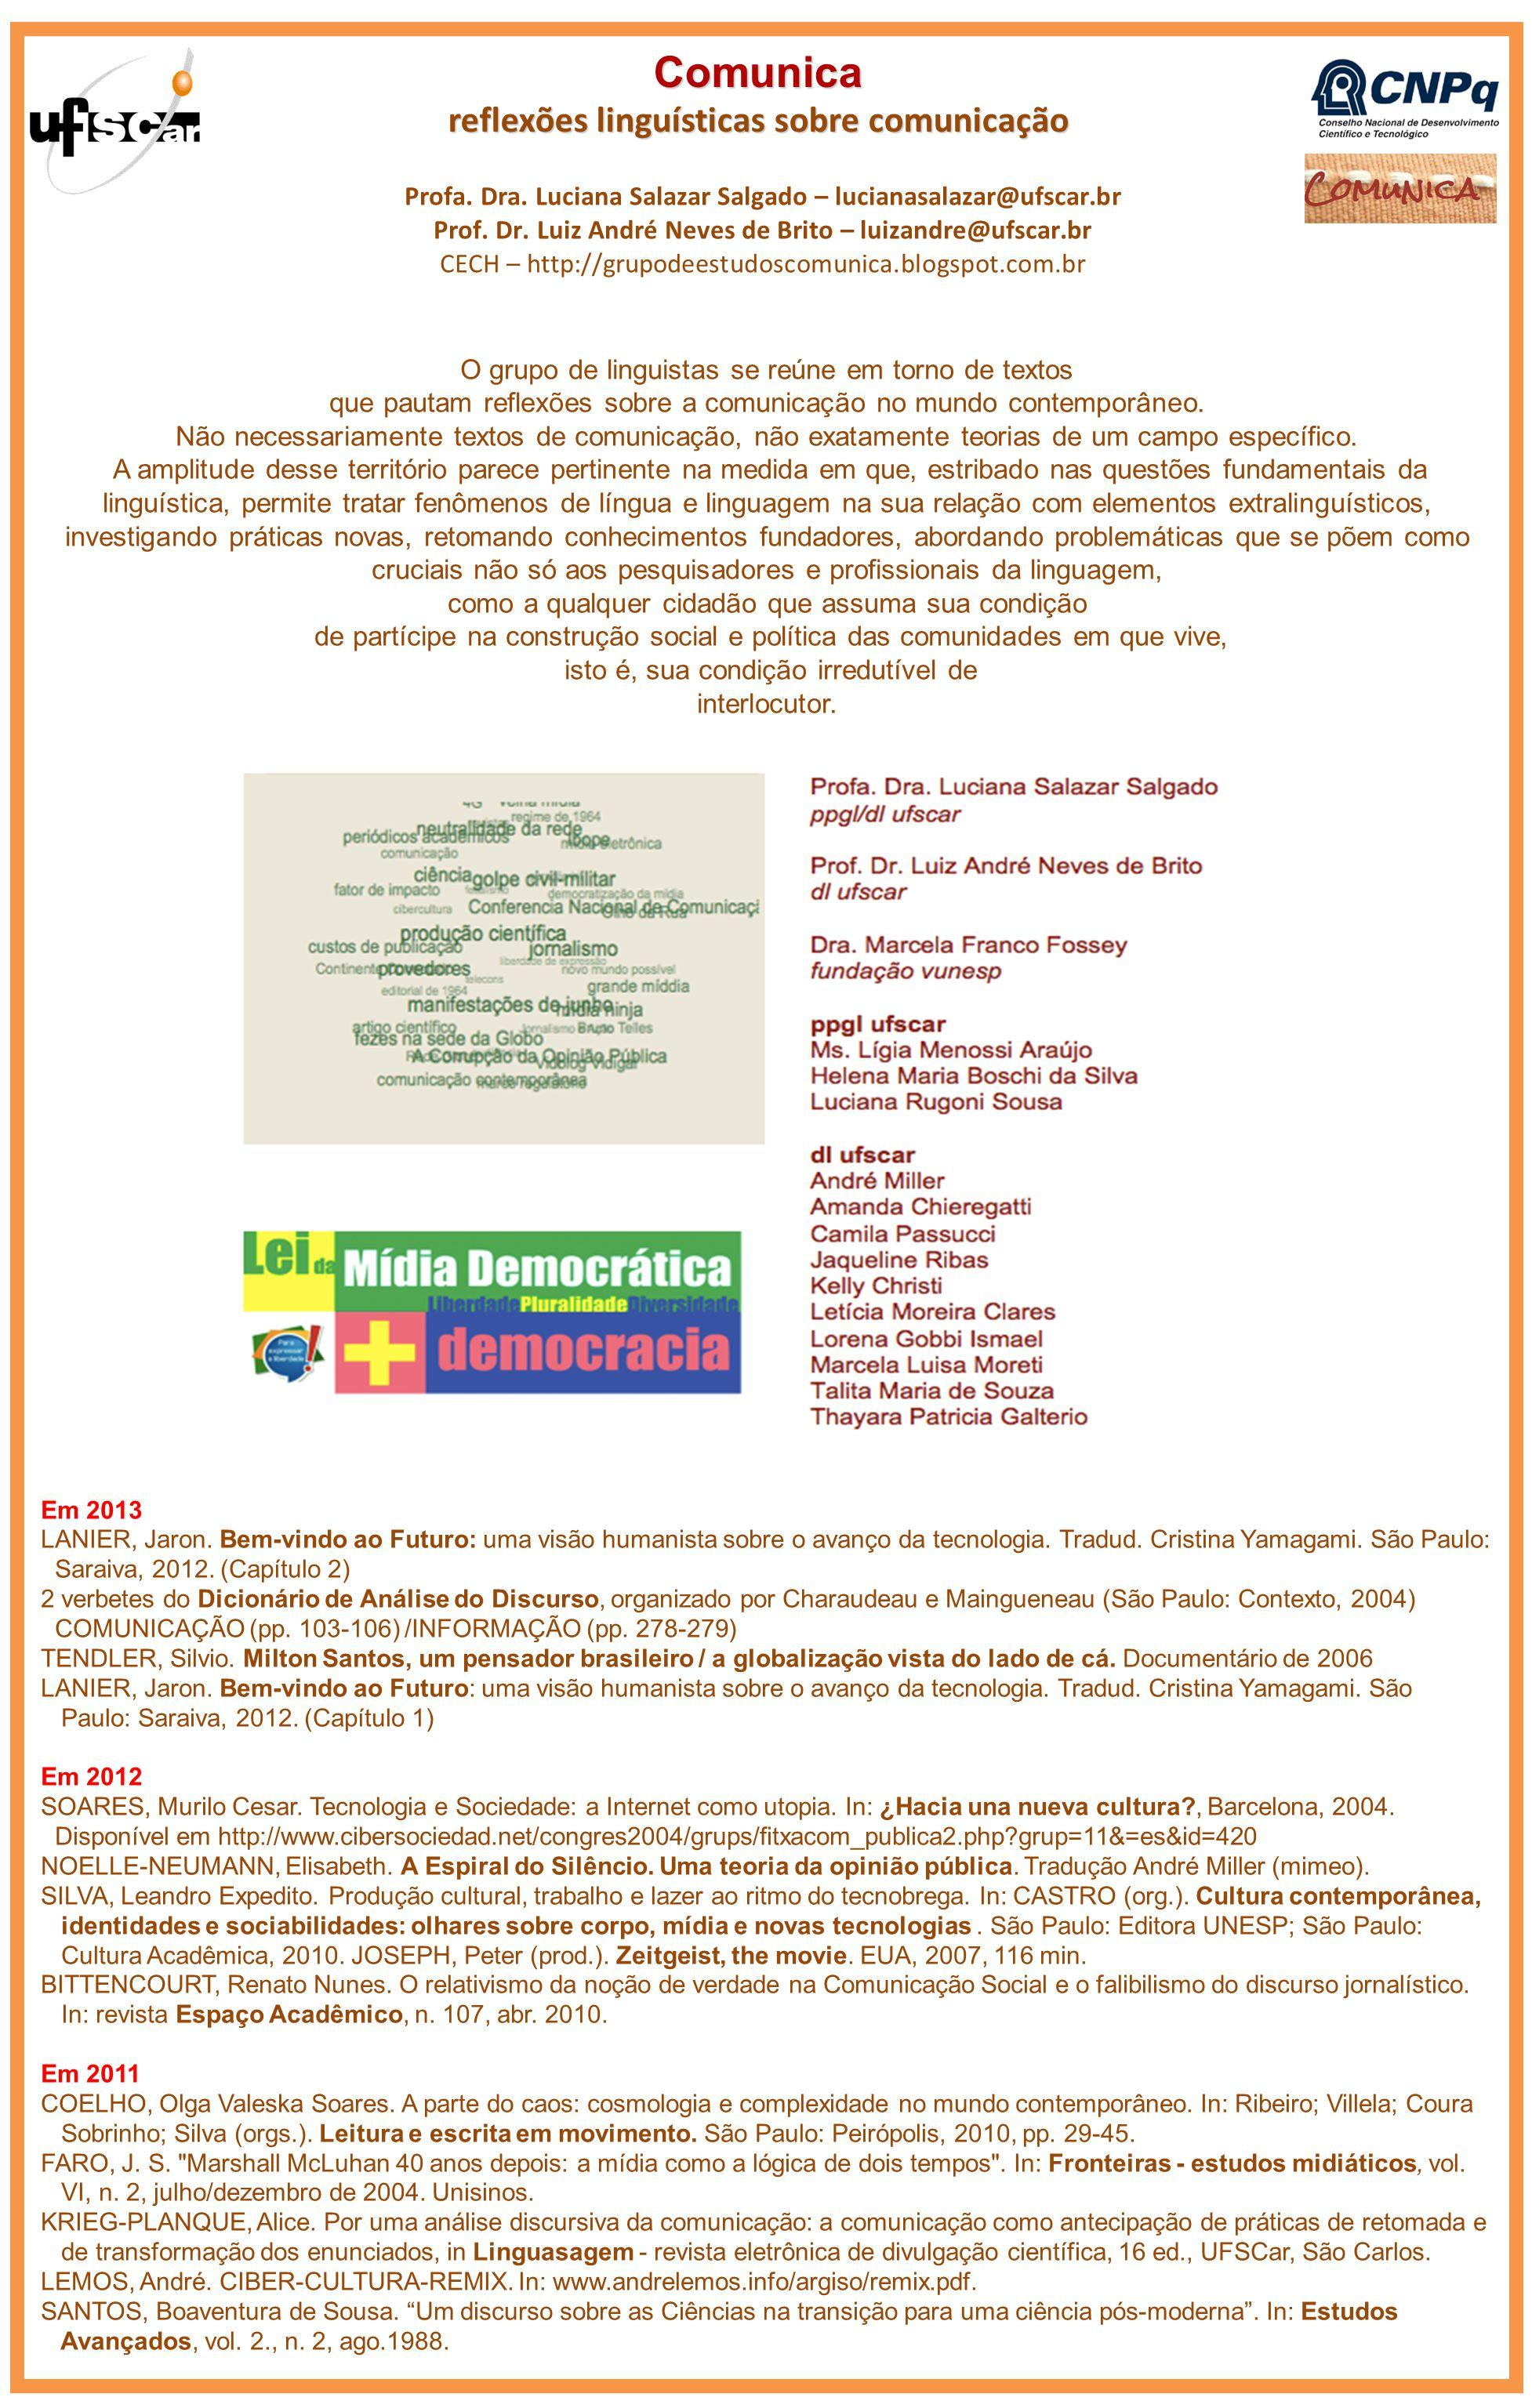 Profa. Dra. Luciana Salazar Salgado – lucianasalazar@ufscar.br Prof. Dr. Luiz André Neves de Brito – luizandre@ufscar.br CECH – http://grupodeestudosc